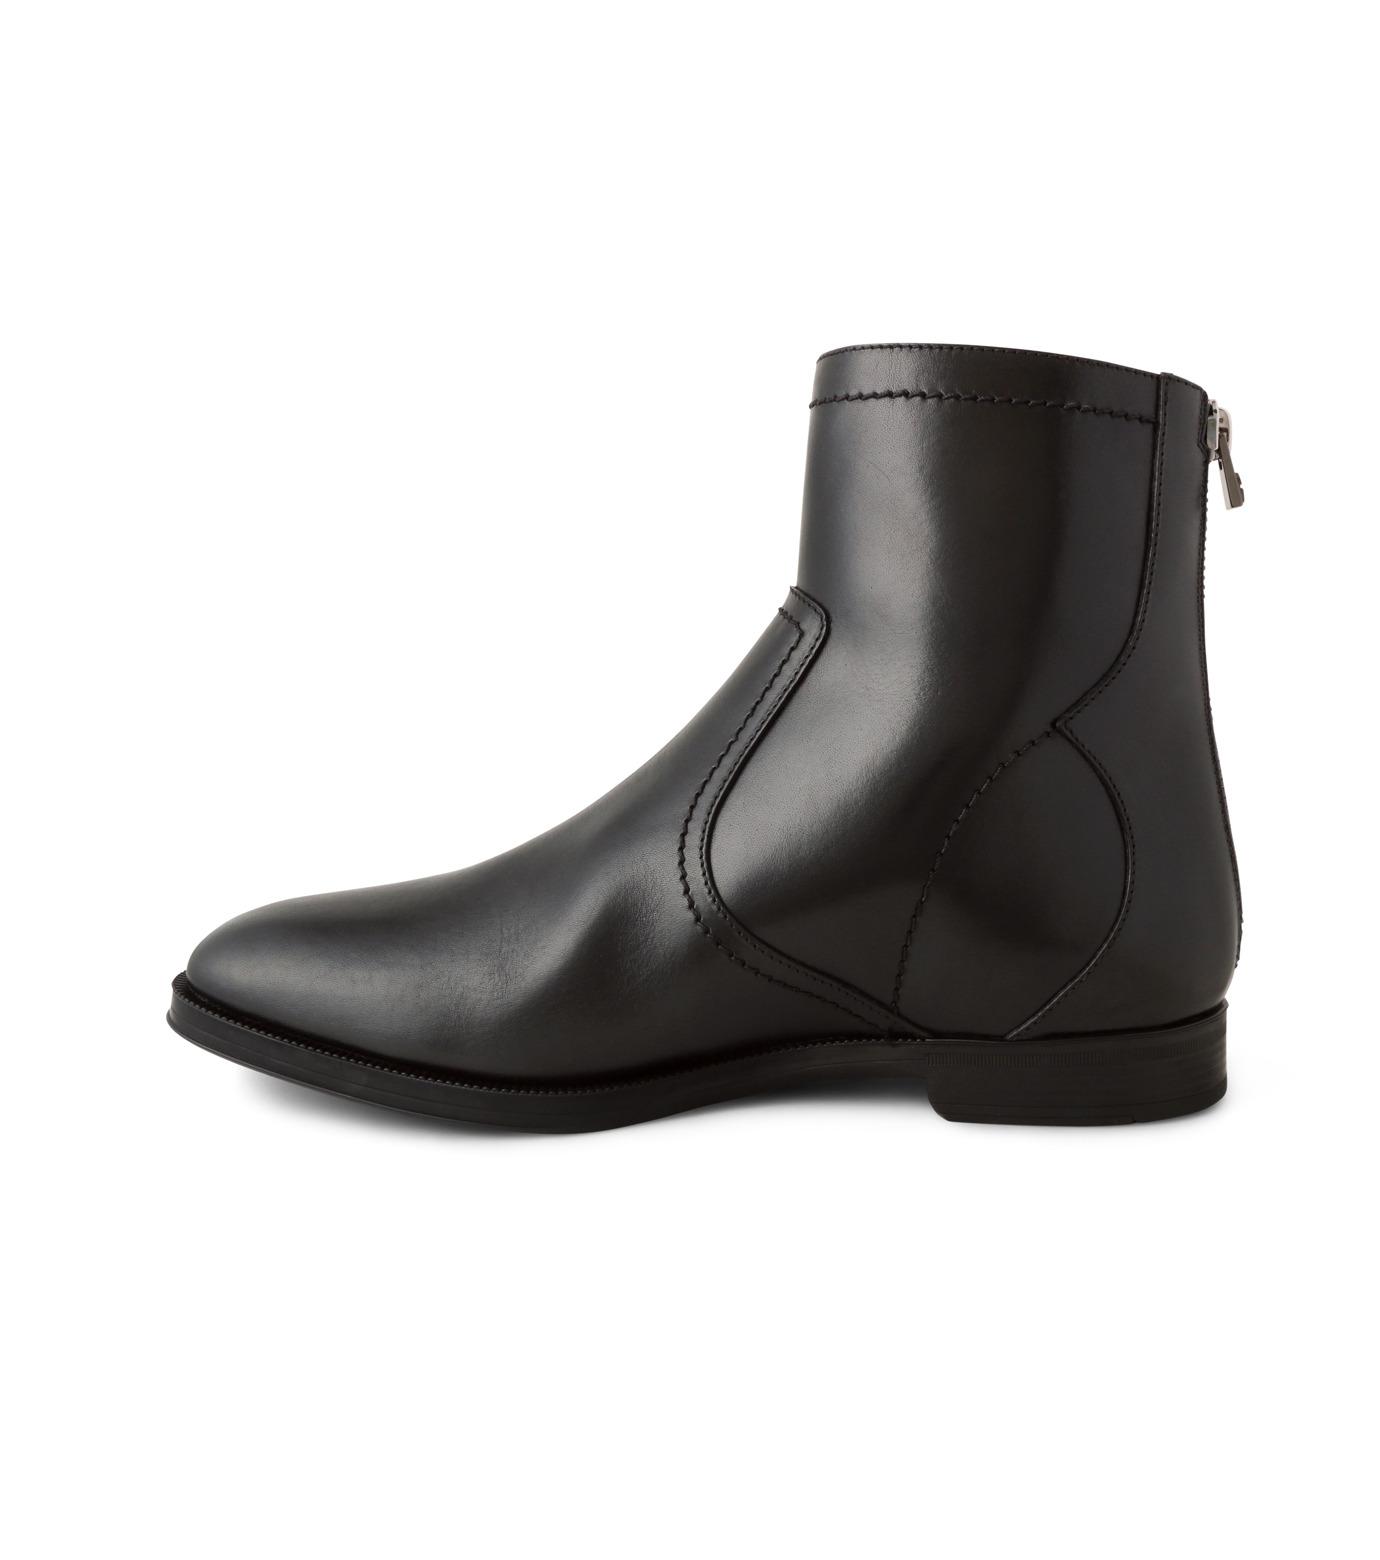 Jimmy Choo(ジミーチュウ)のMouton Boots-BLACK(ブーツ/boots)-PABLO-SVS-13 拡大詳細画像3